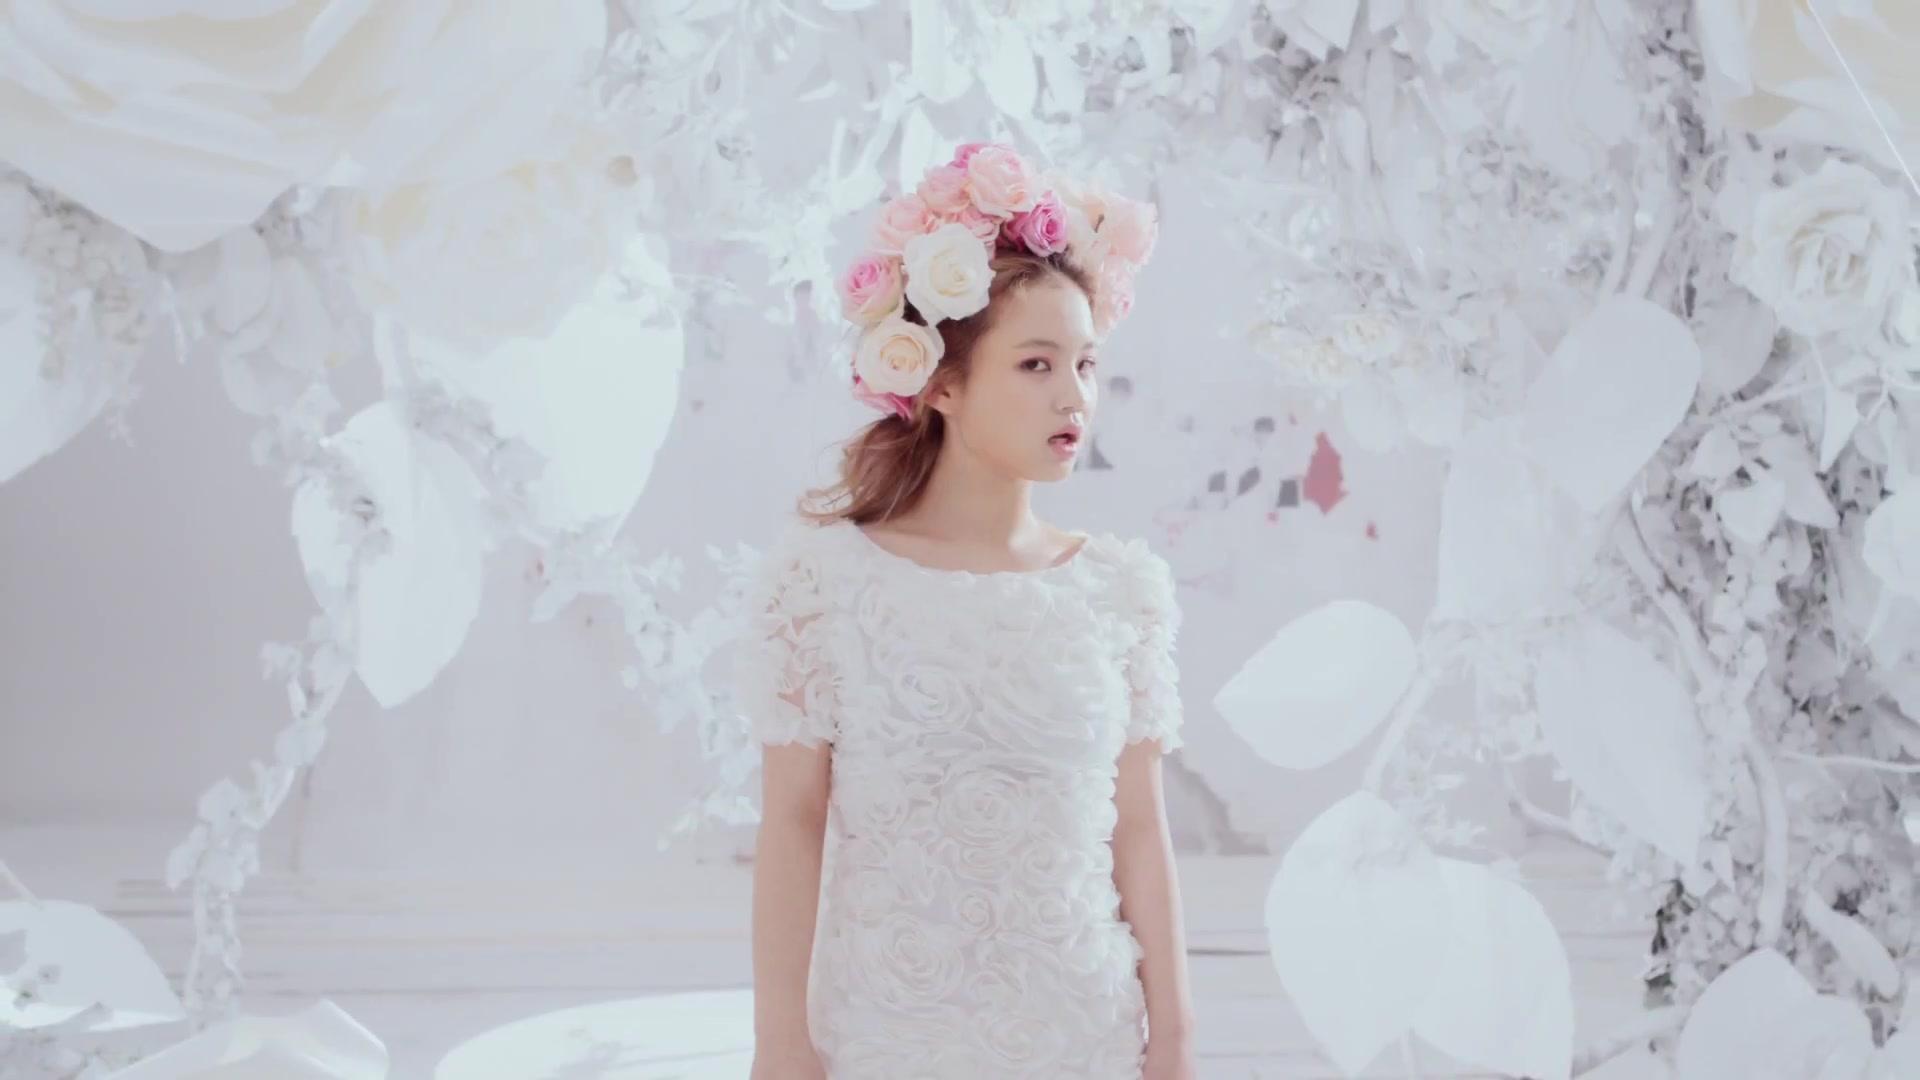 李夏怡 - rose mv (yt 1080p)